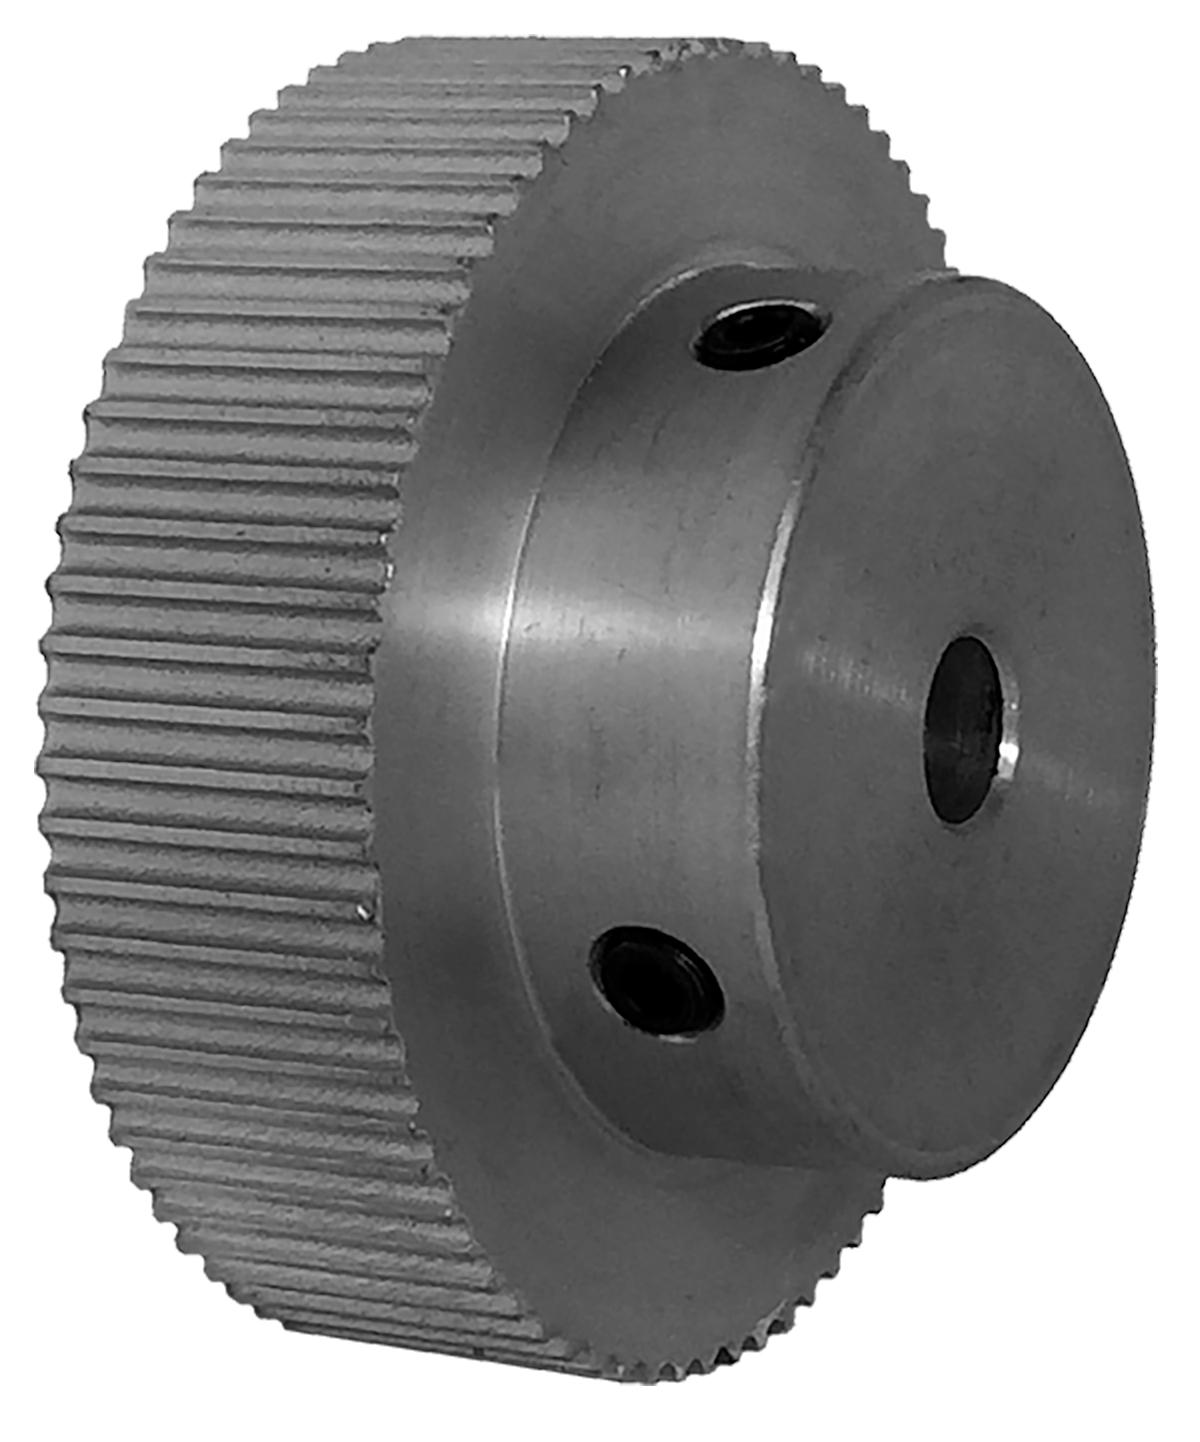 74-2P09-6A3 - Aluminum Powerhouse® Pulleys